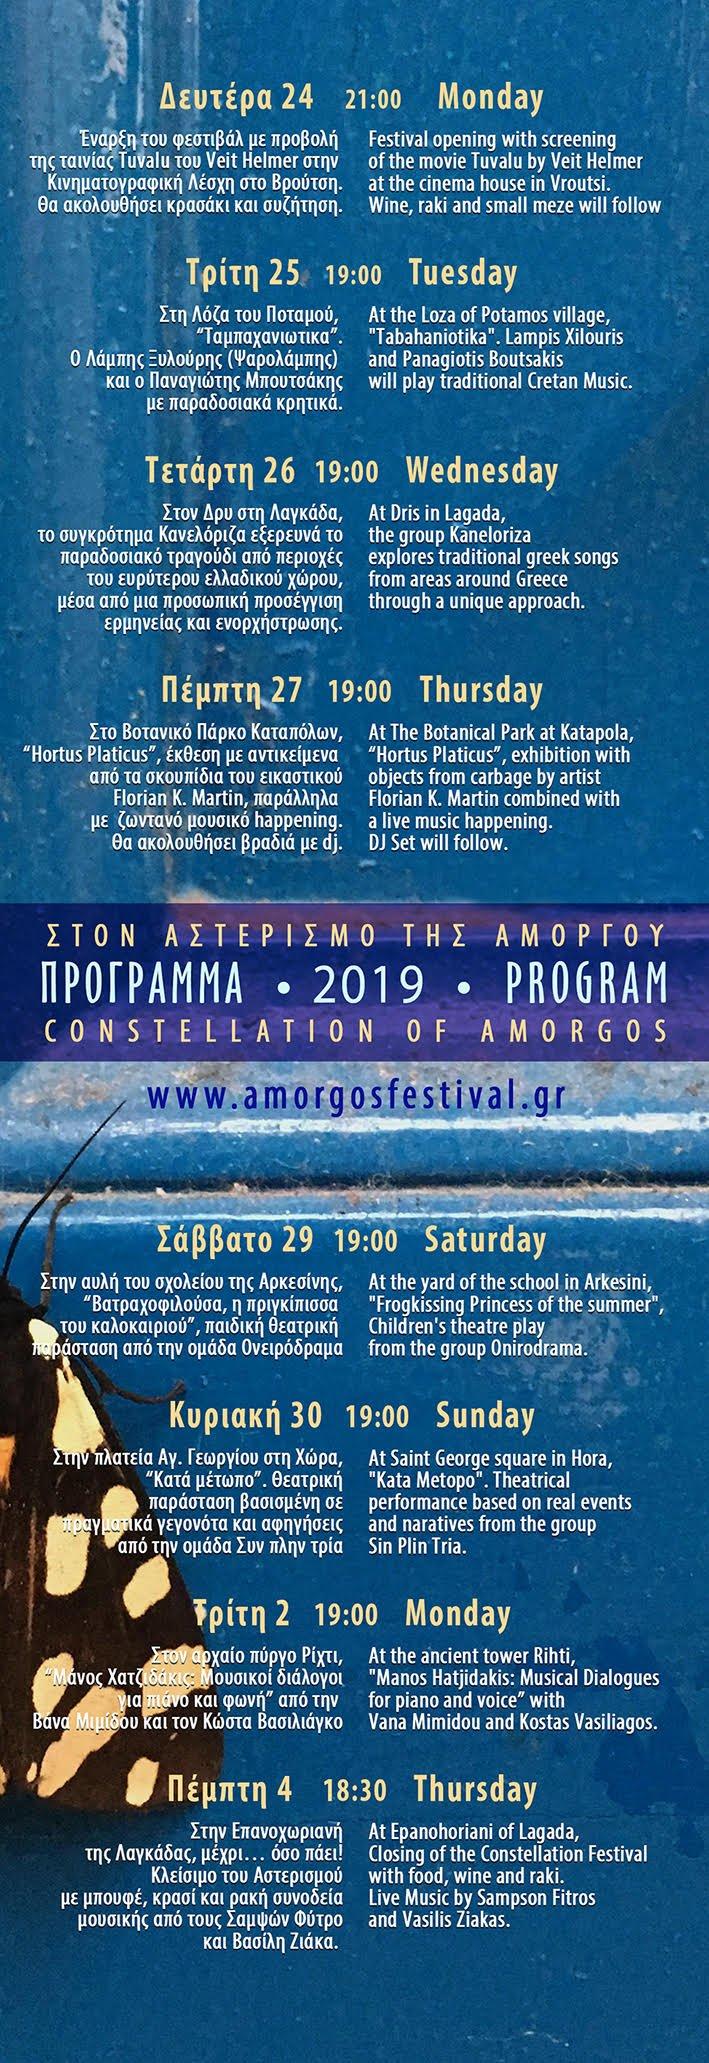 Program Amorgos Festival